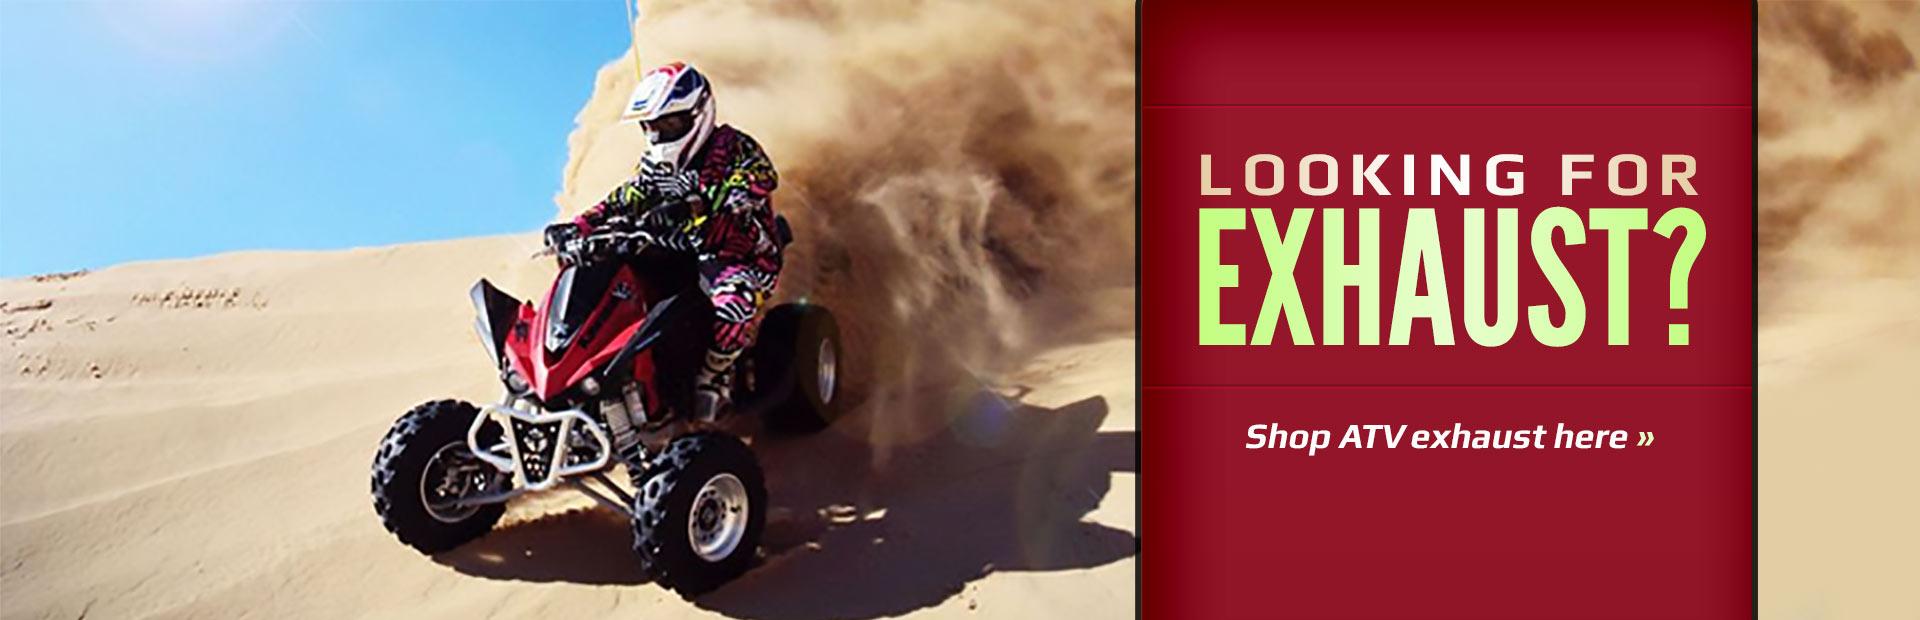 Looking for exhaust? Shop ATV exhaust here.